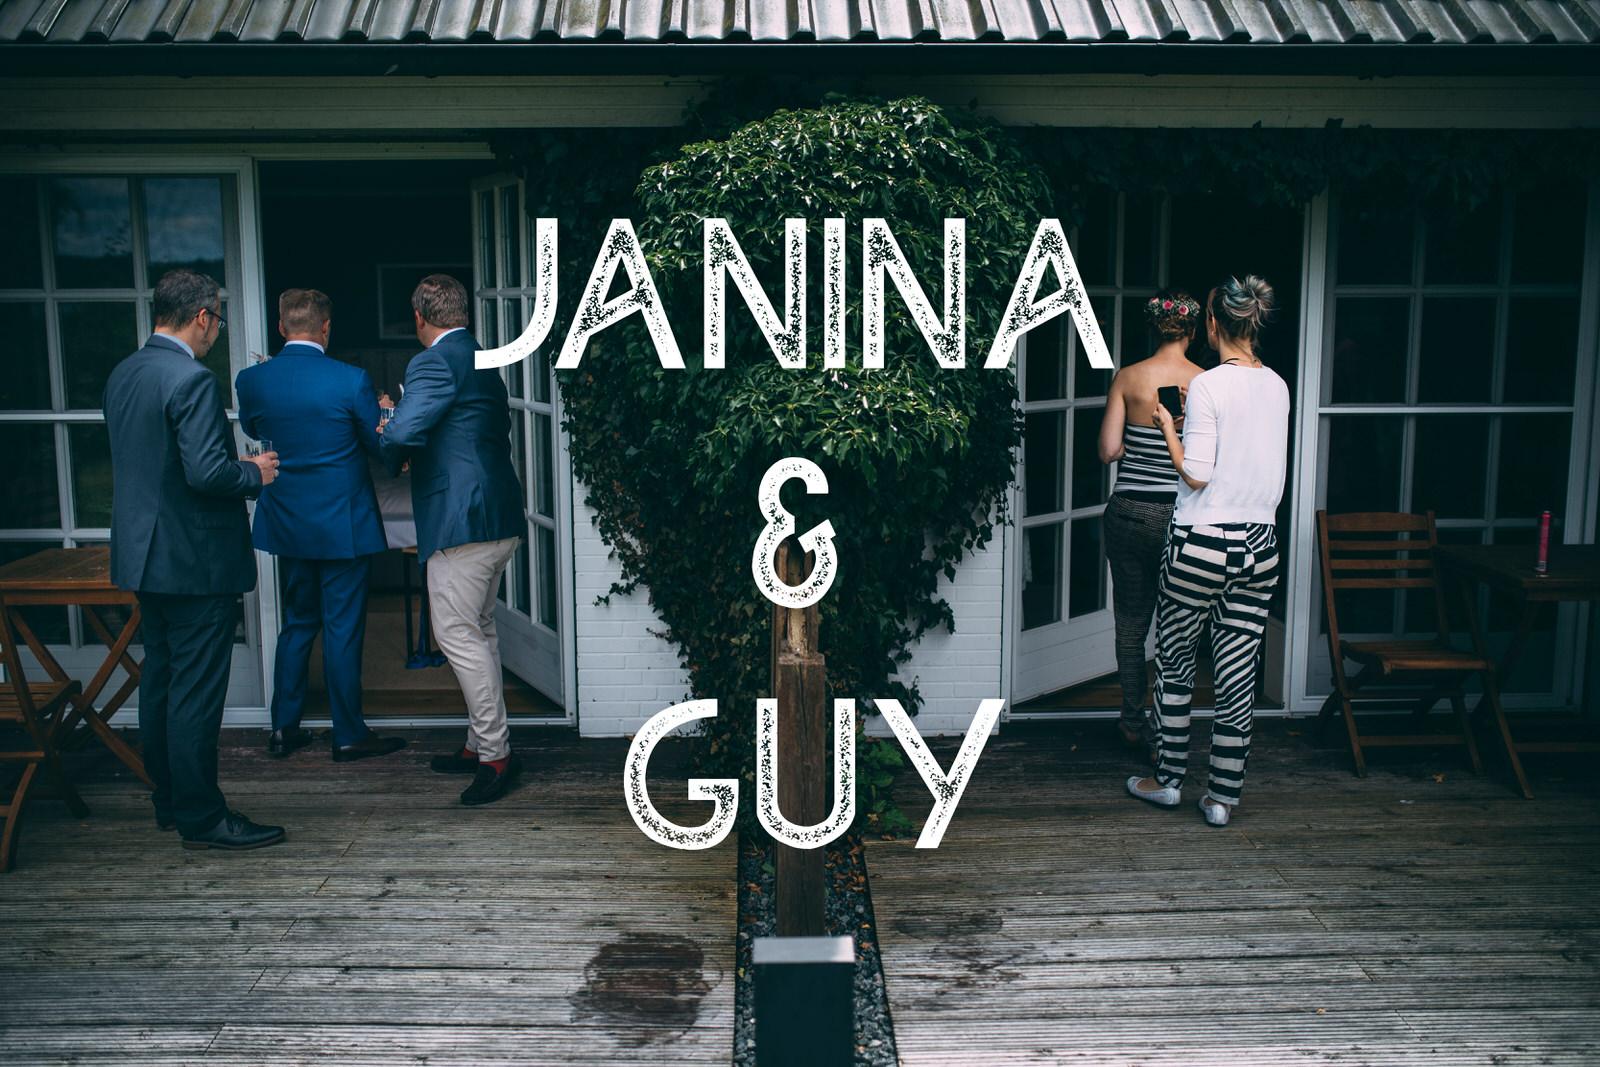 Janina und Guy